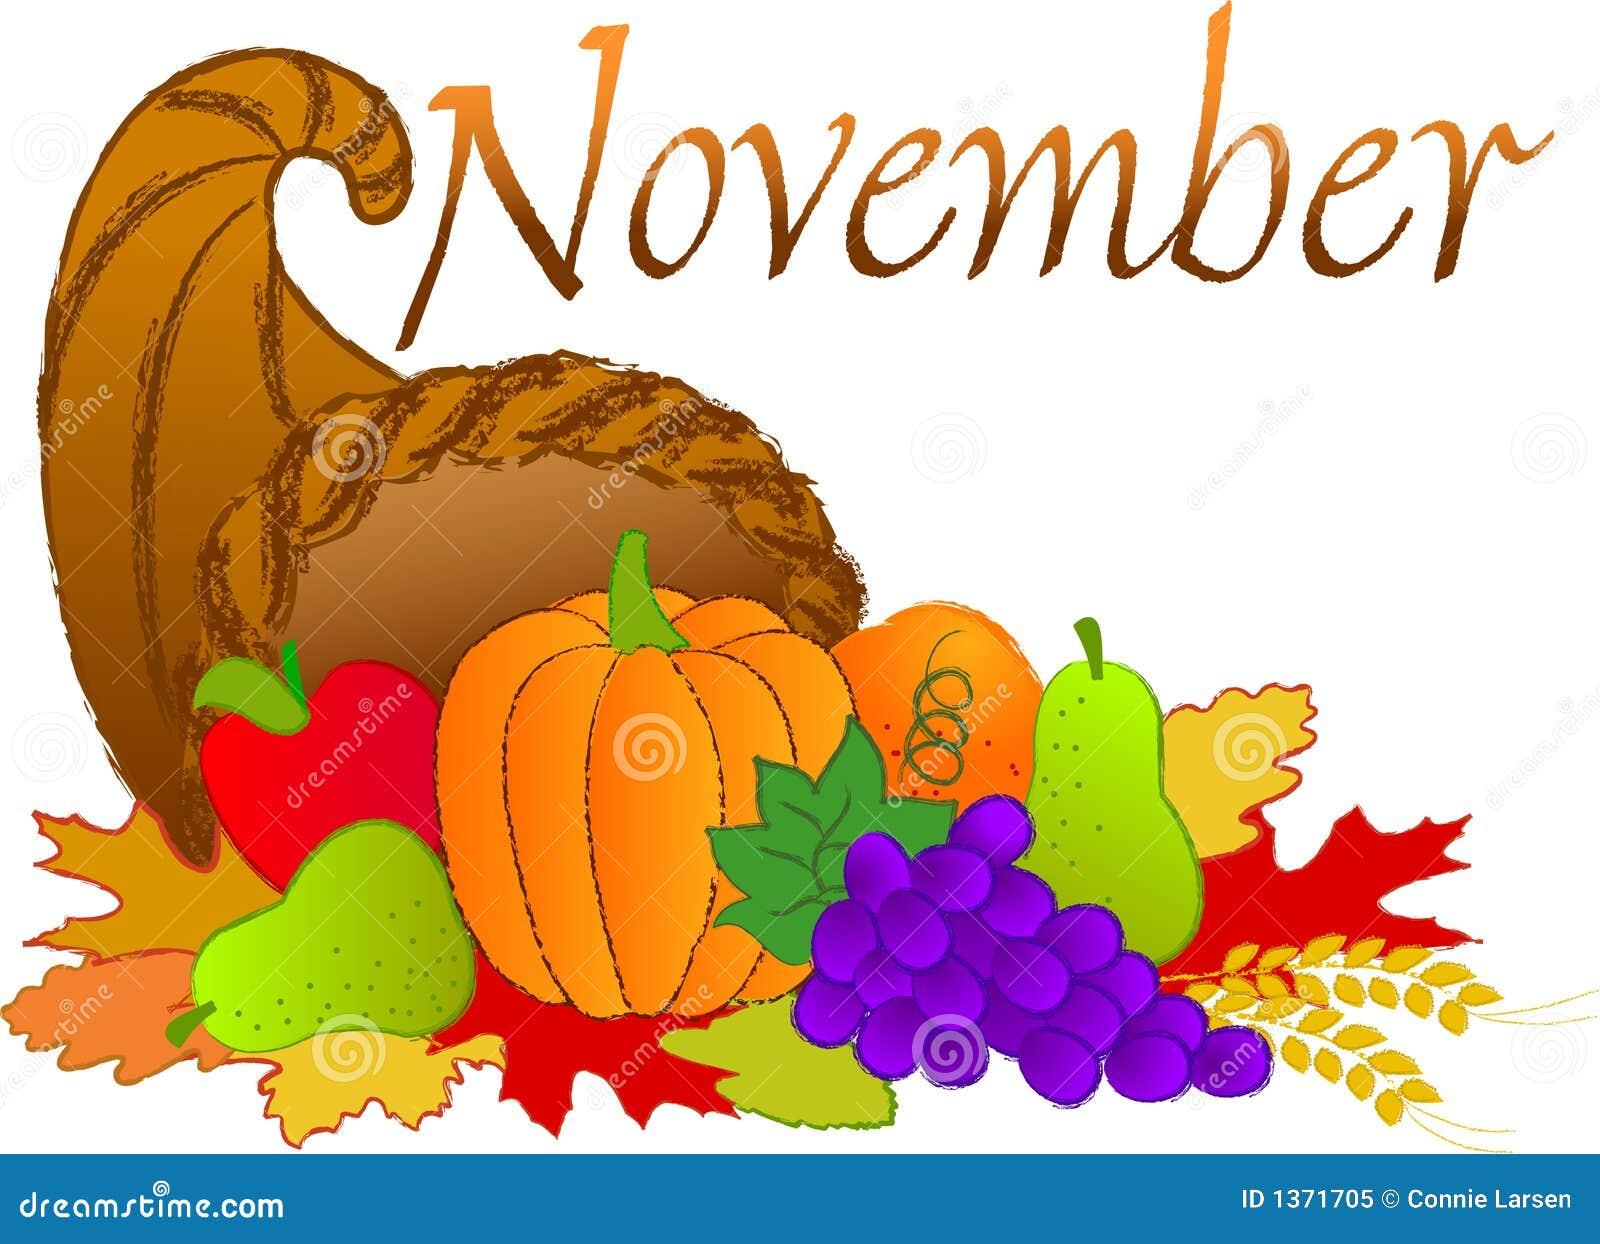 november stock illustration image of drawing horn